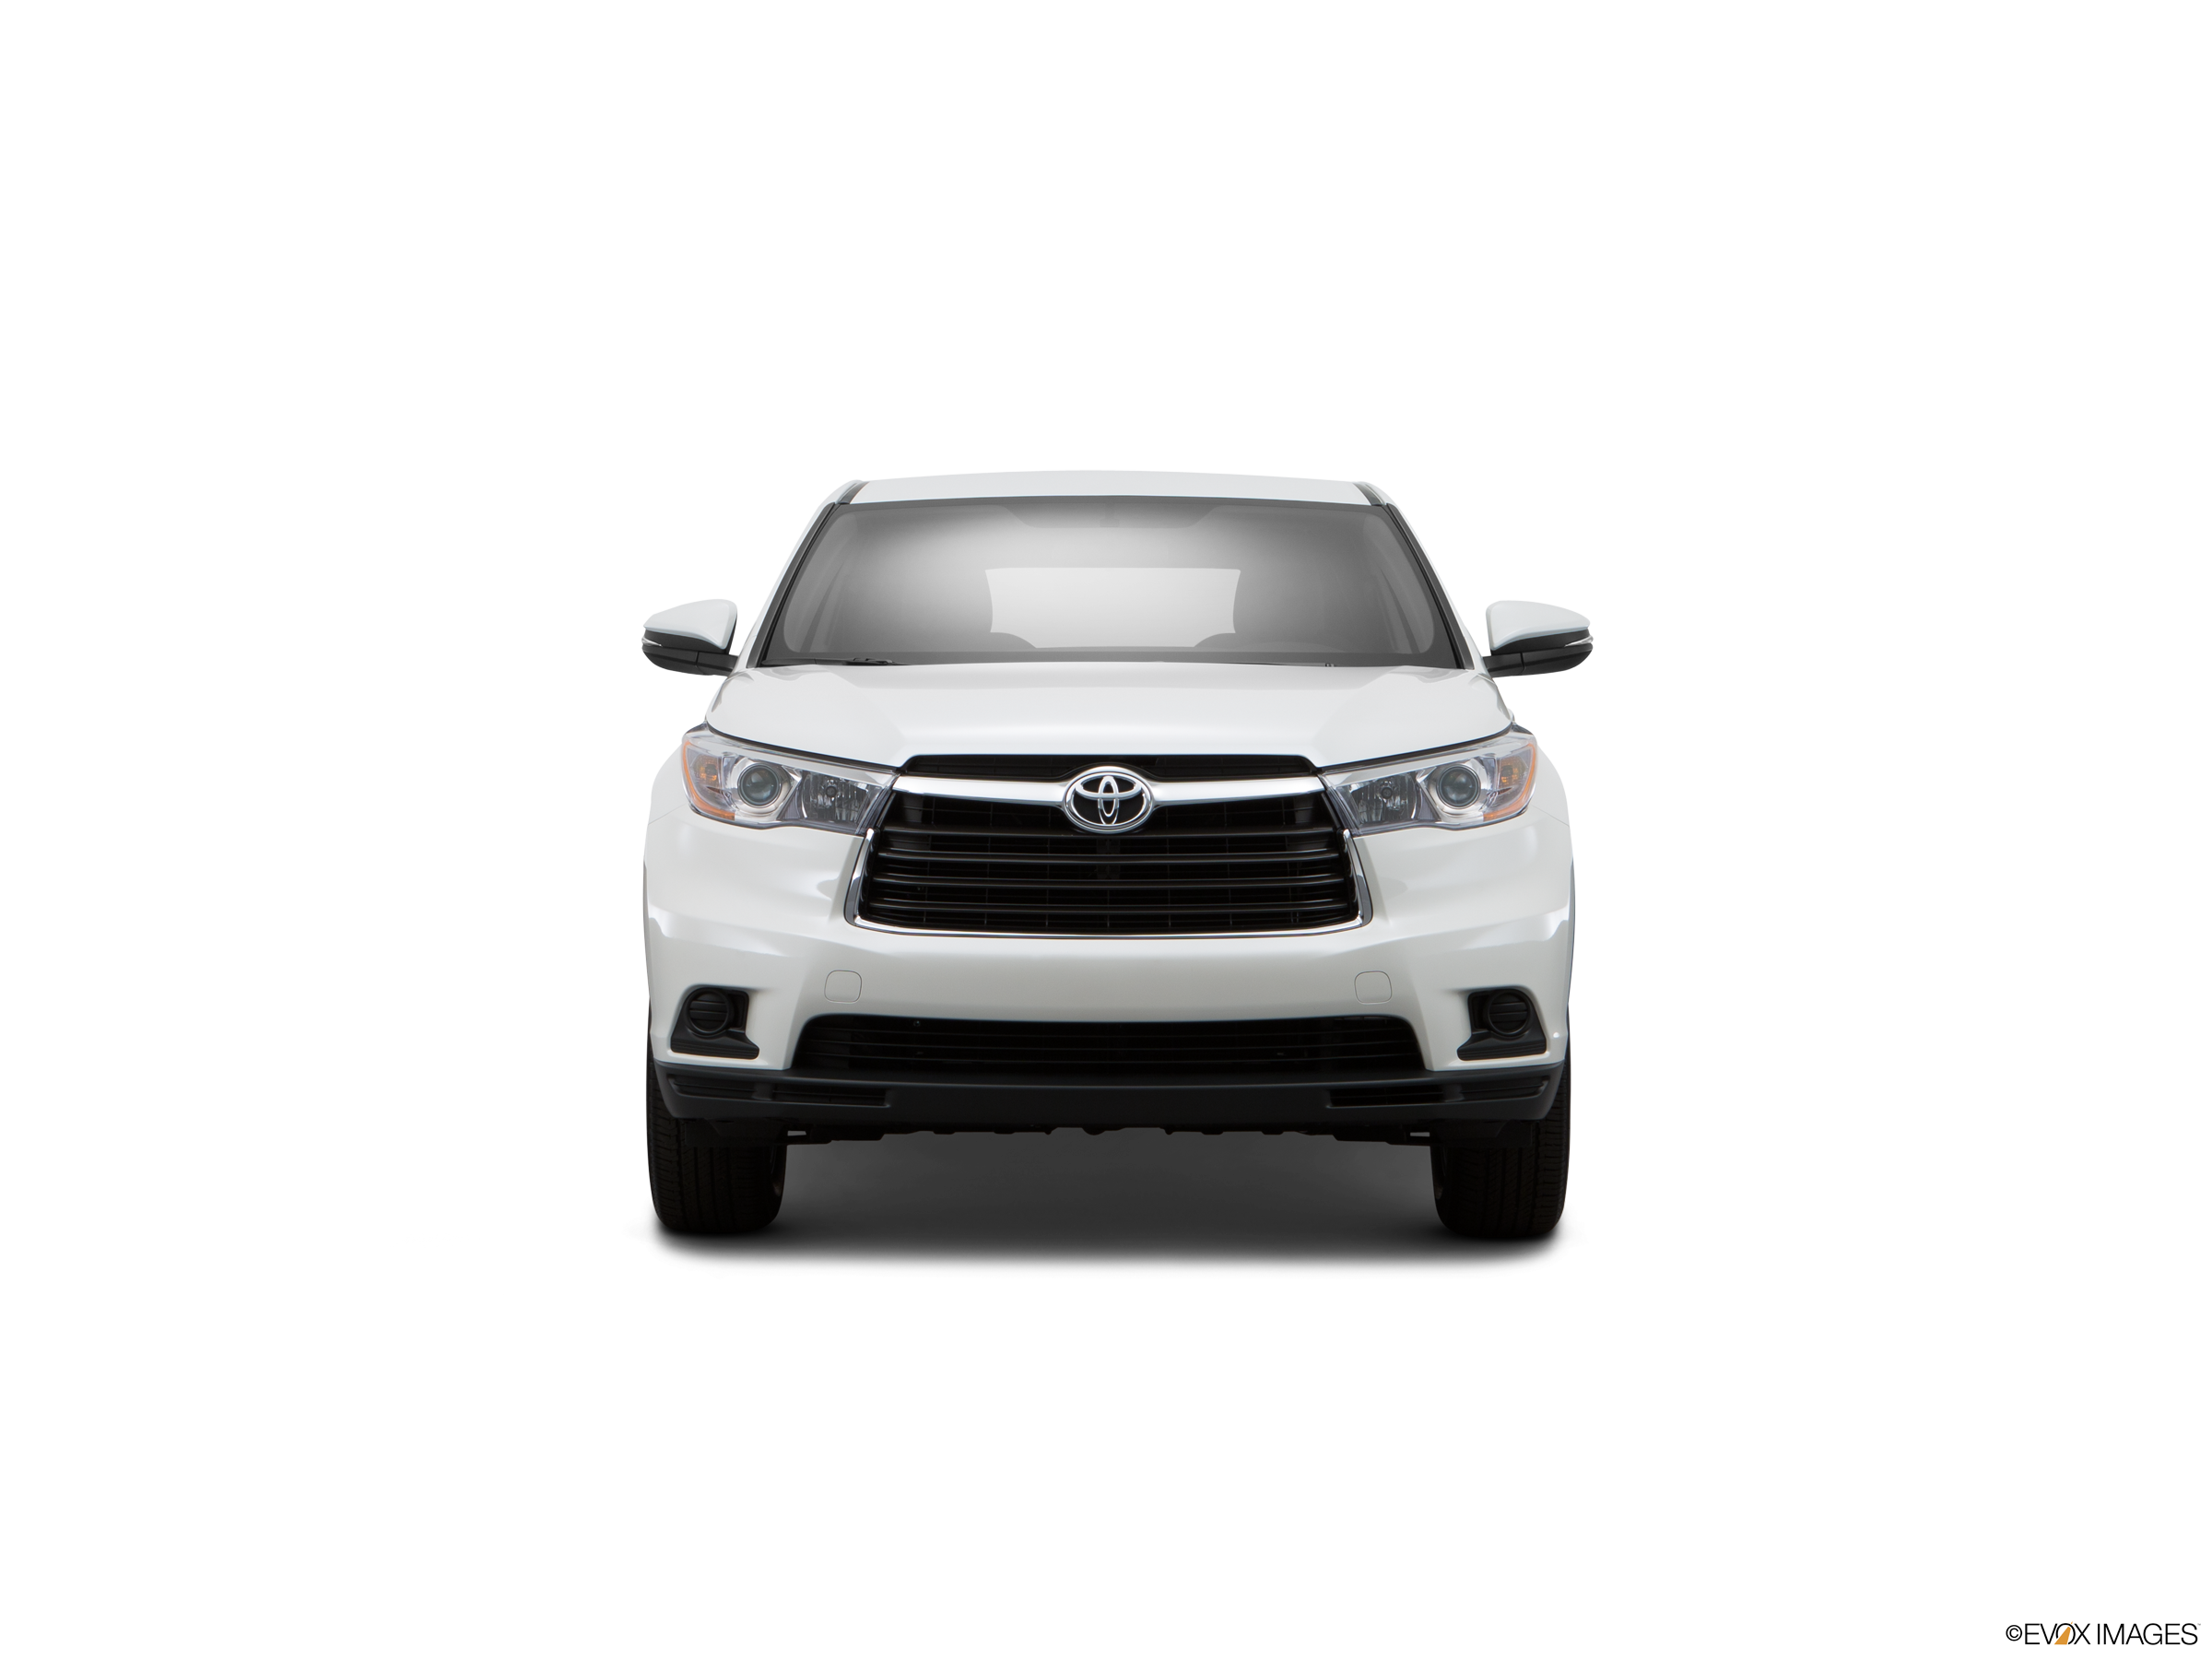 Used 2015 Toyota Highlander Values Cars For Sale Kelley Blue Book